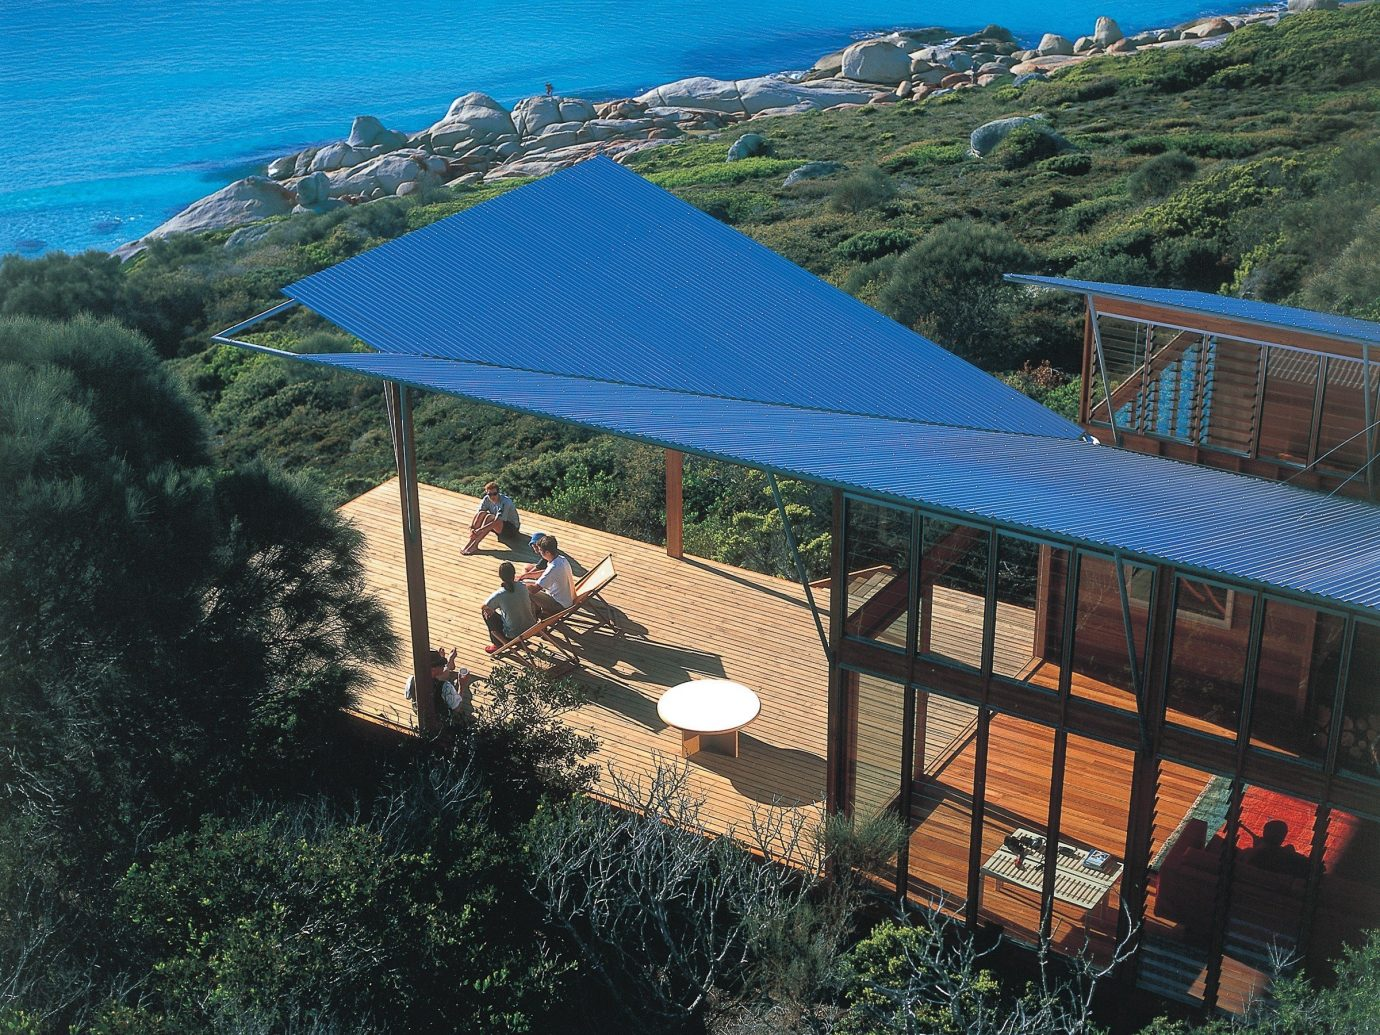 Hotels Outdoors + Adventure outdoor mountain area hillside lush